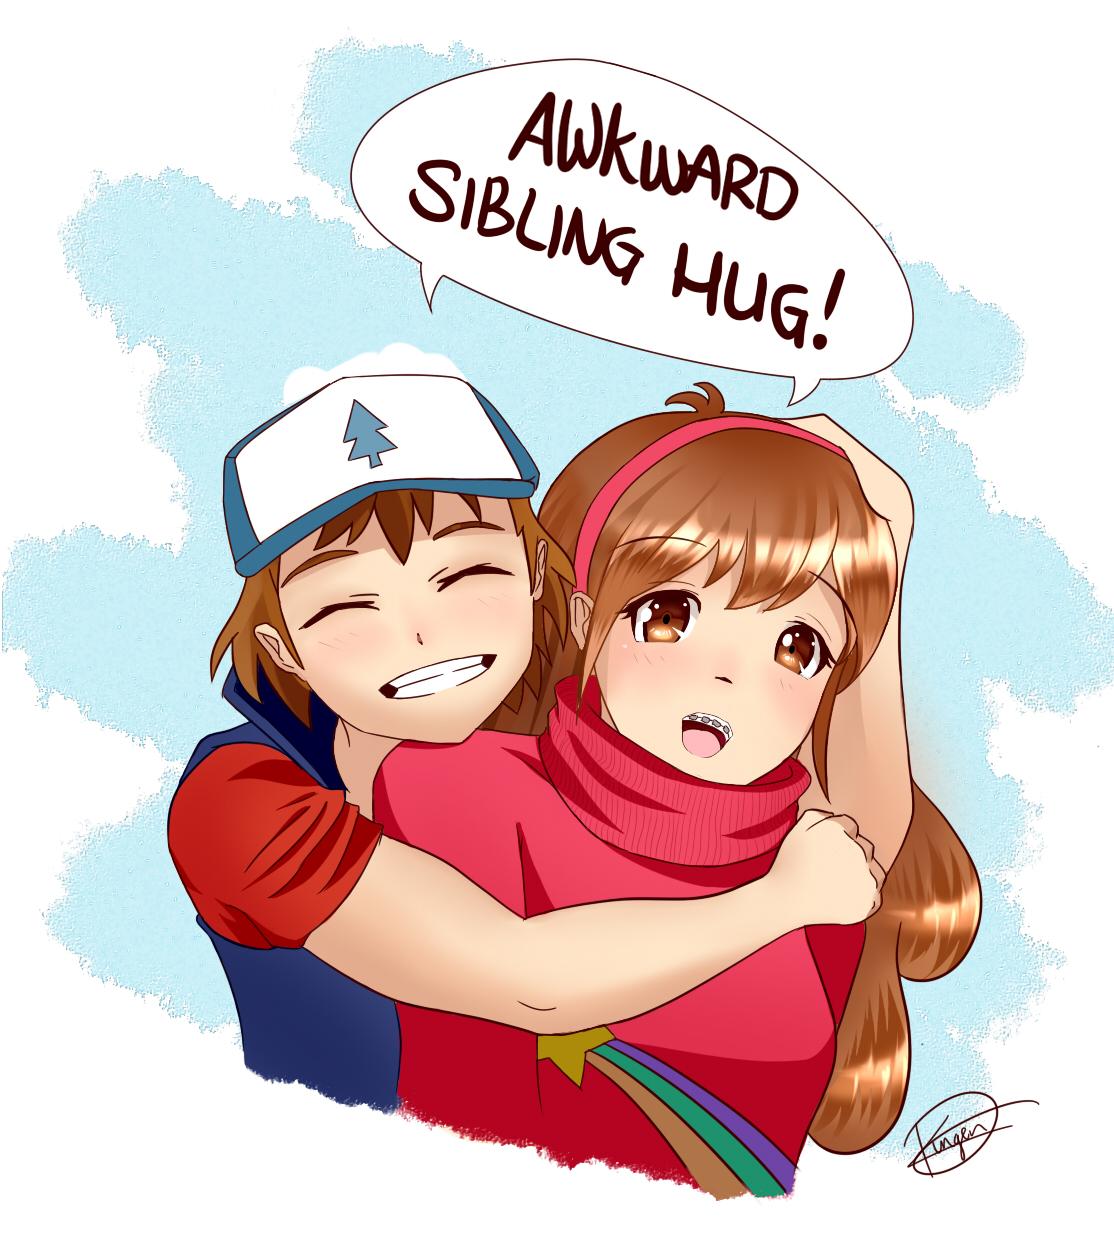 Awkward Sibling hug! - Gravity Falls